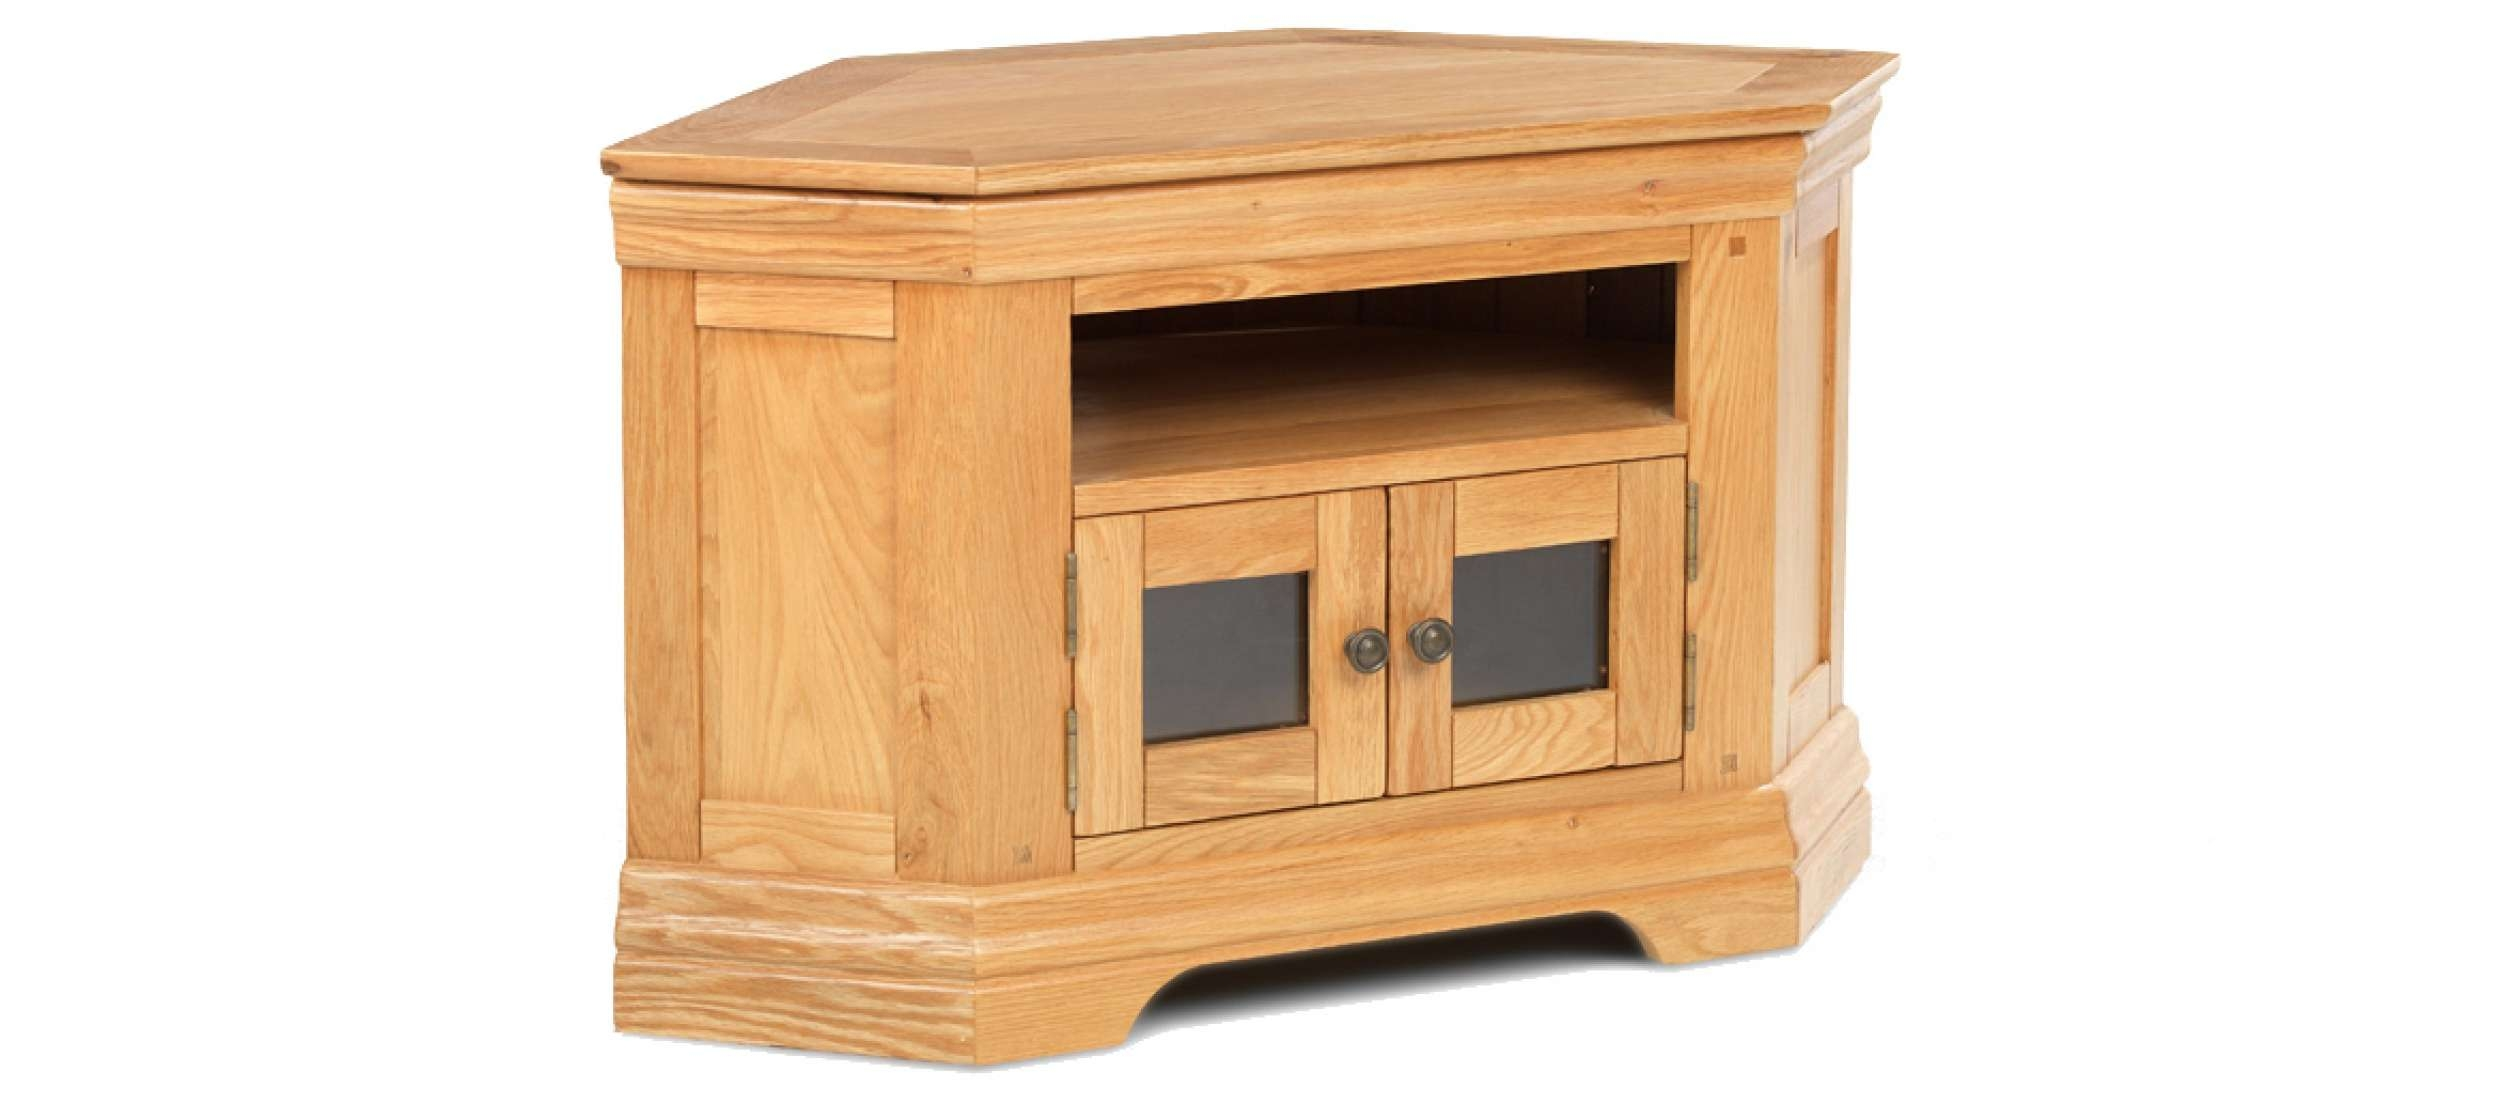 Constance Oak Corner Tv Cabinet | Quercus Living In Wooden Corner Tv Cabinets (View 3 of 20)